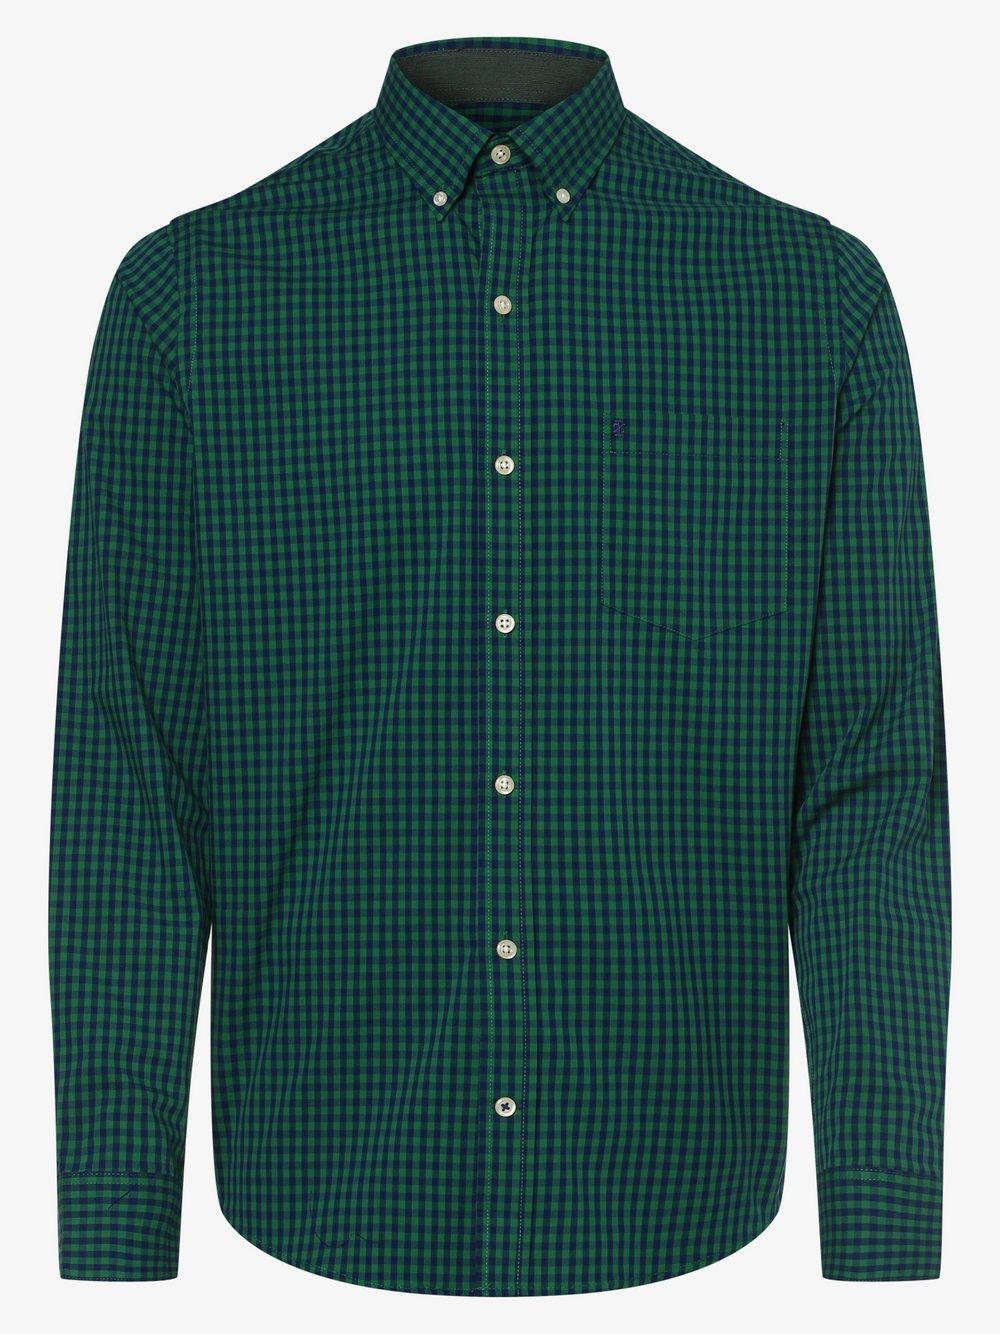 IZOD - Koszula męska, zielony